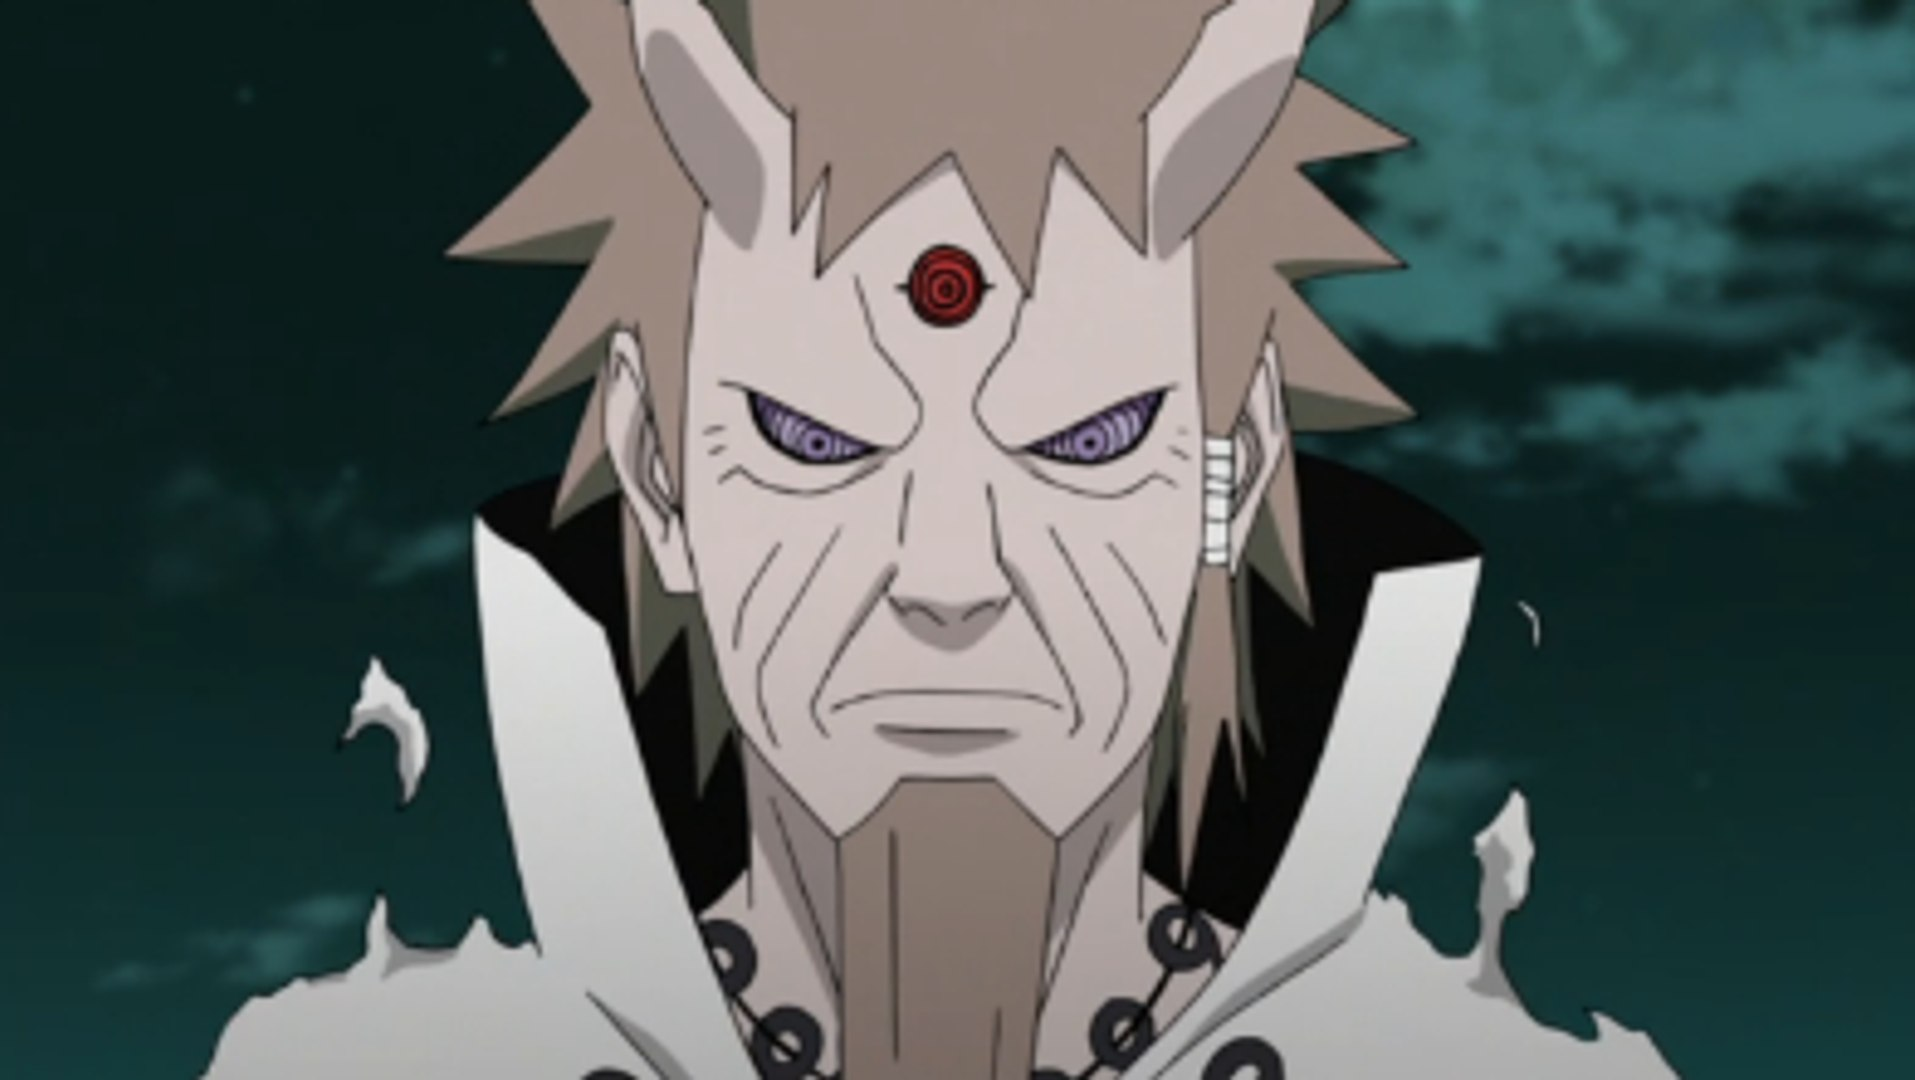 Naruto Shippuden Episode 463 - ナルト- 疾風伝 Review - TEAM 7 BATTLE, NARUTO & SASUKE VS KAGUYA FIGHT!